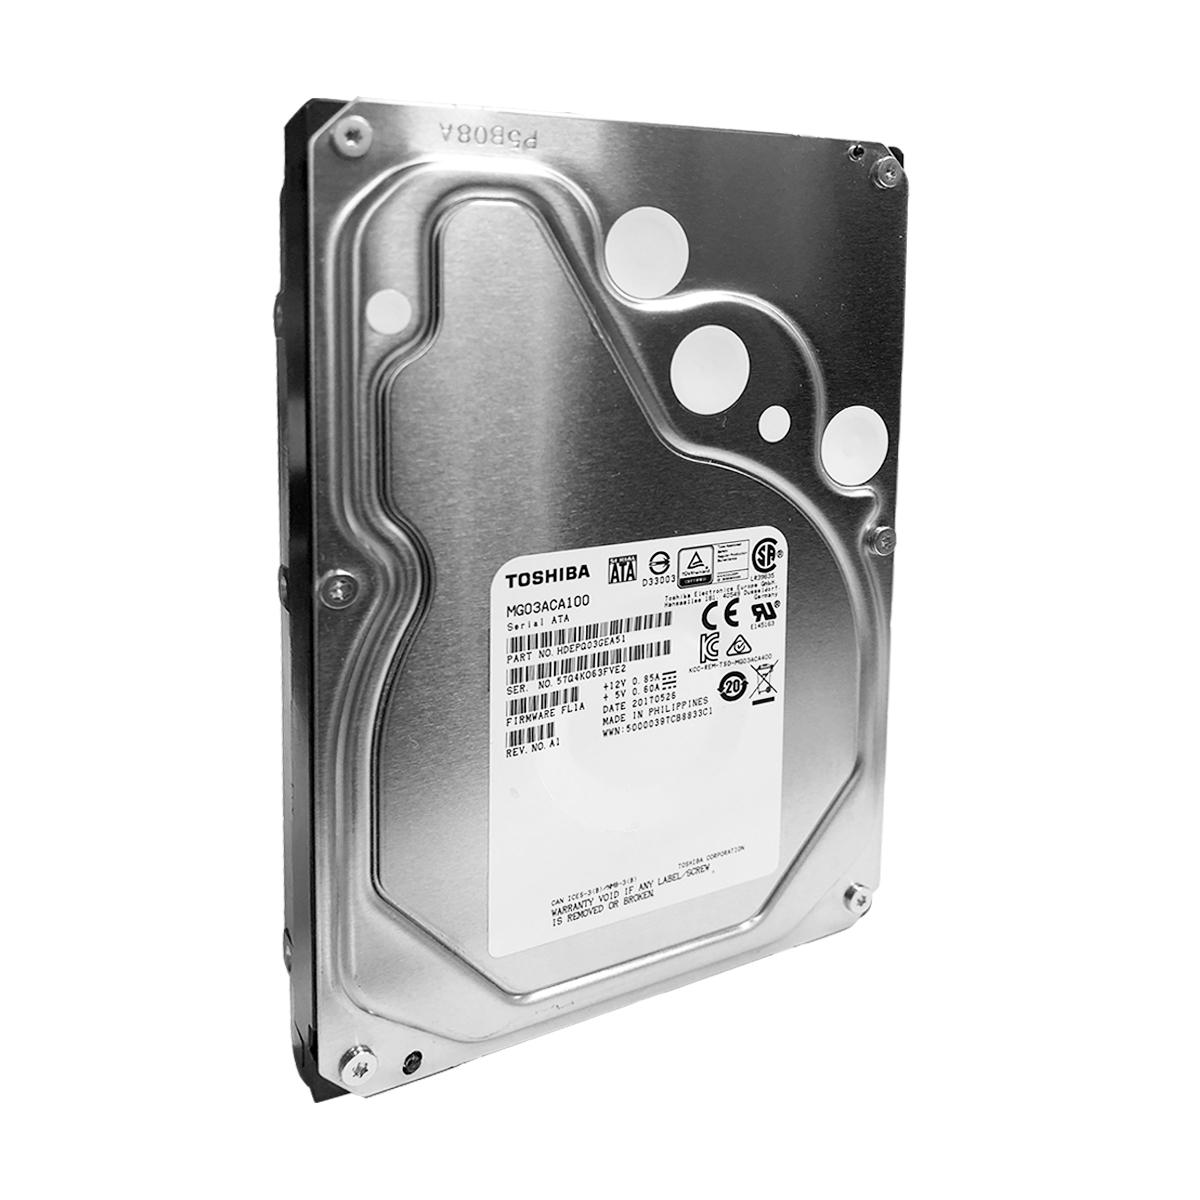 "Hd Toshiba 1TB SATA III ENTERPRISE 3,5"" 7.200RPM 64MB MG03ACA100 24x7"